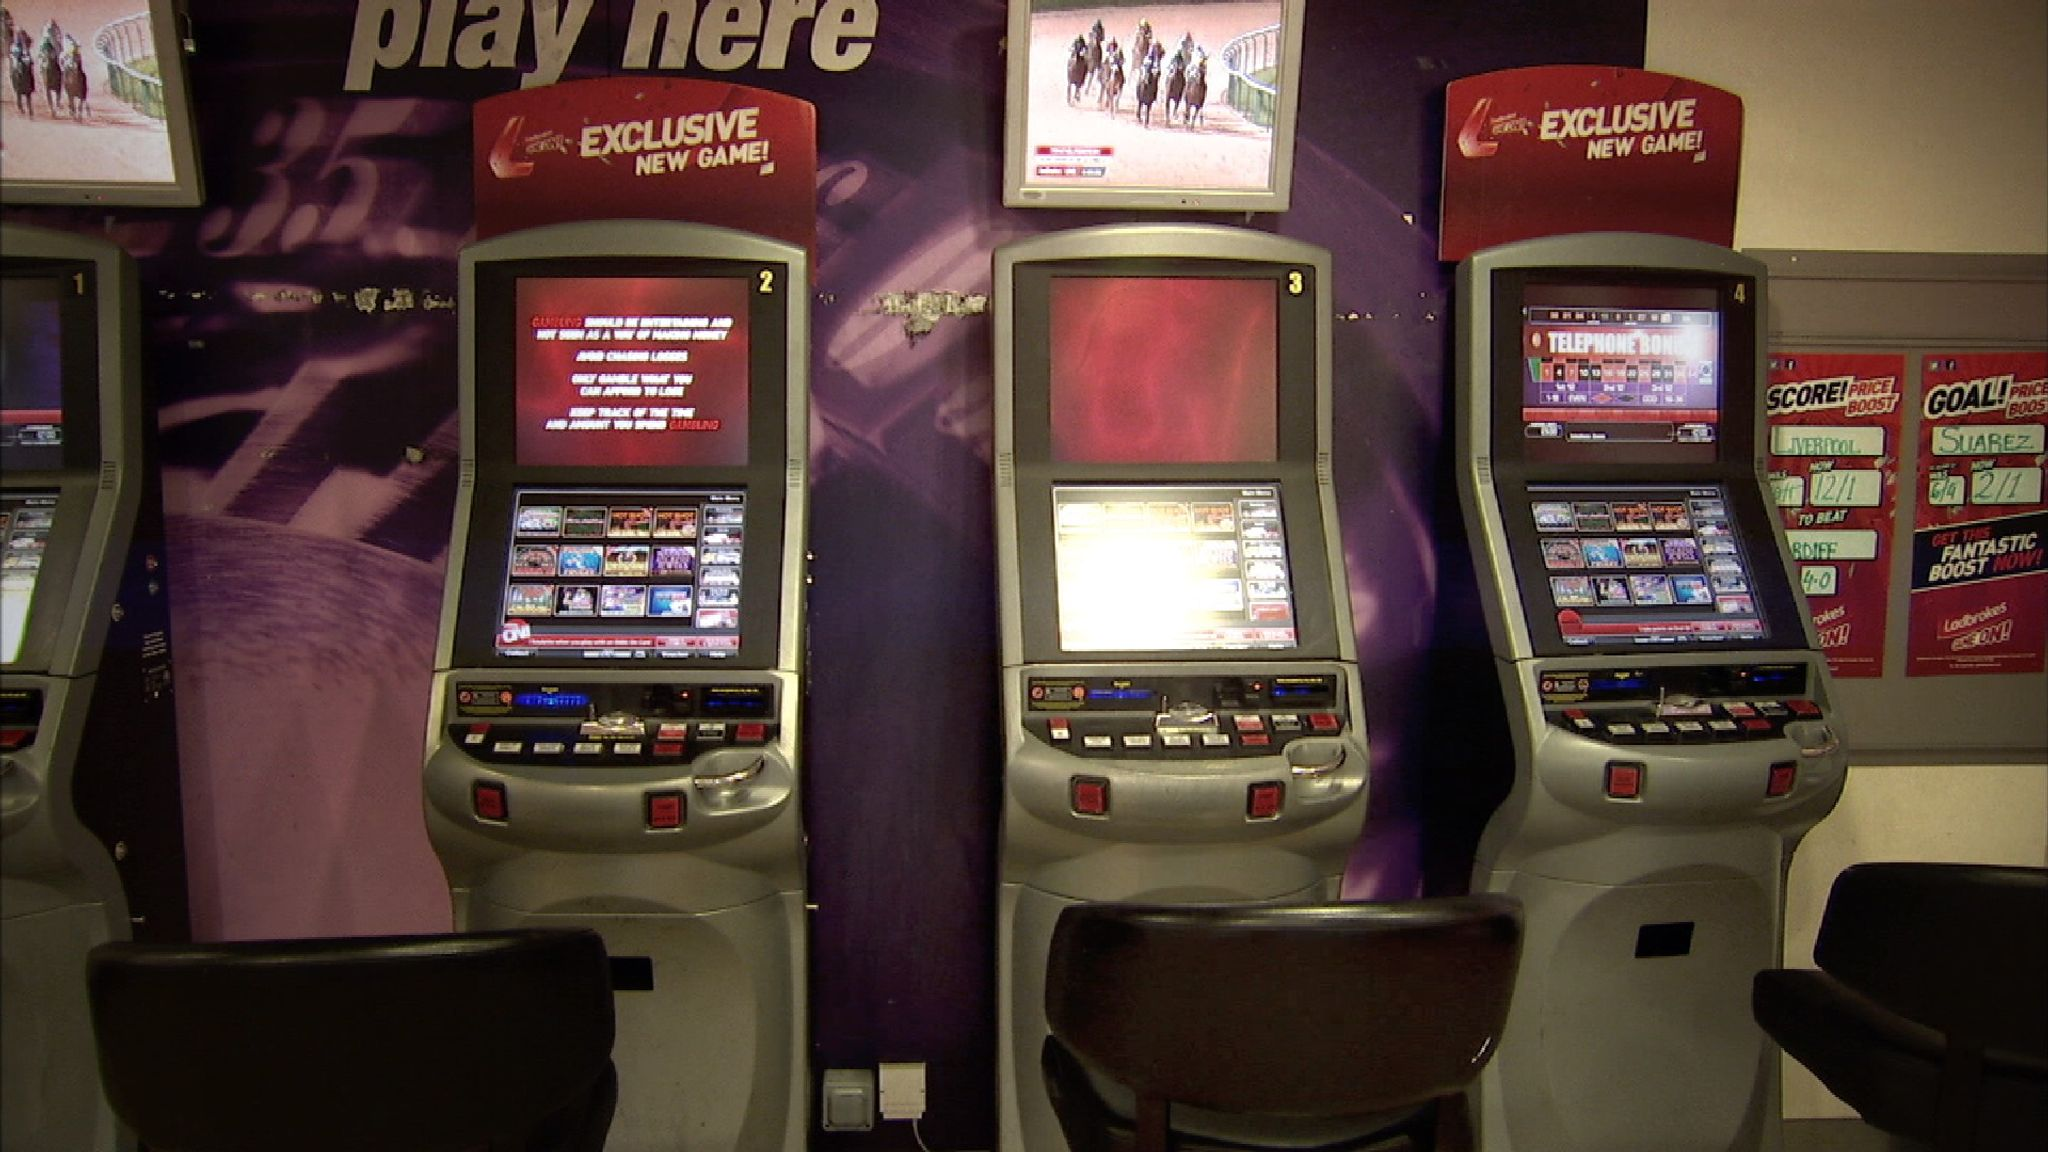 fixed odds betting ladbrokes games